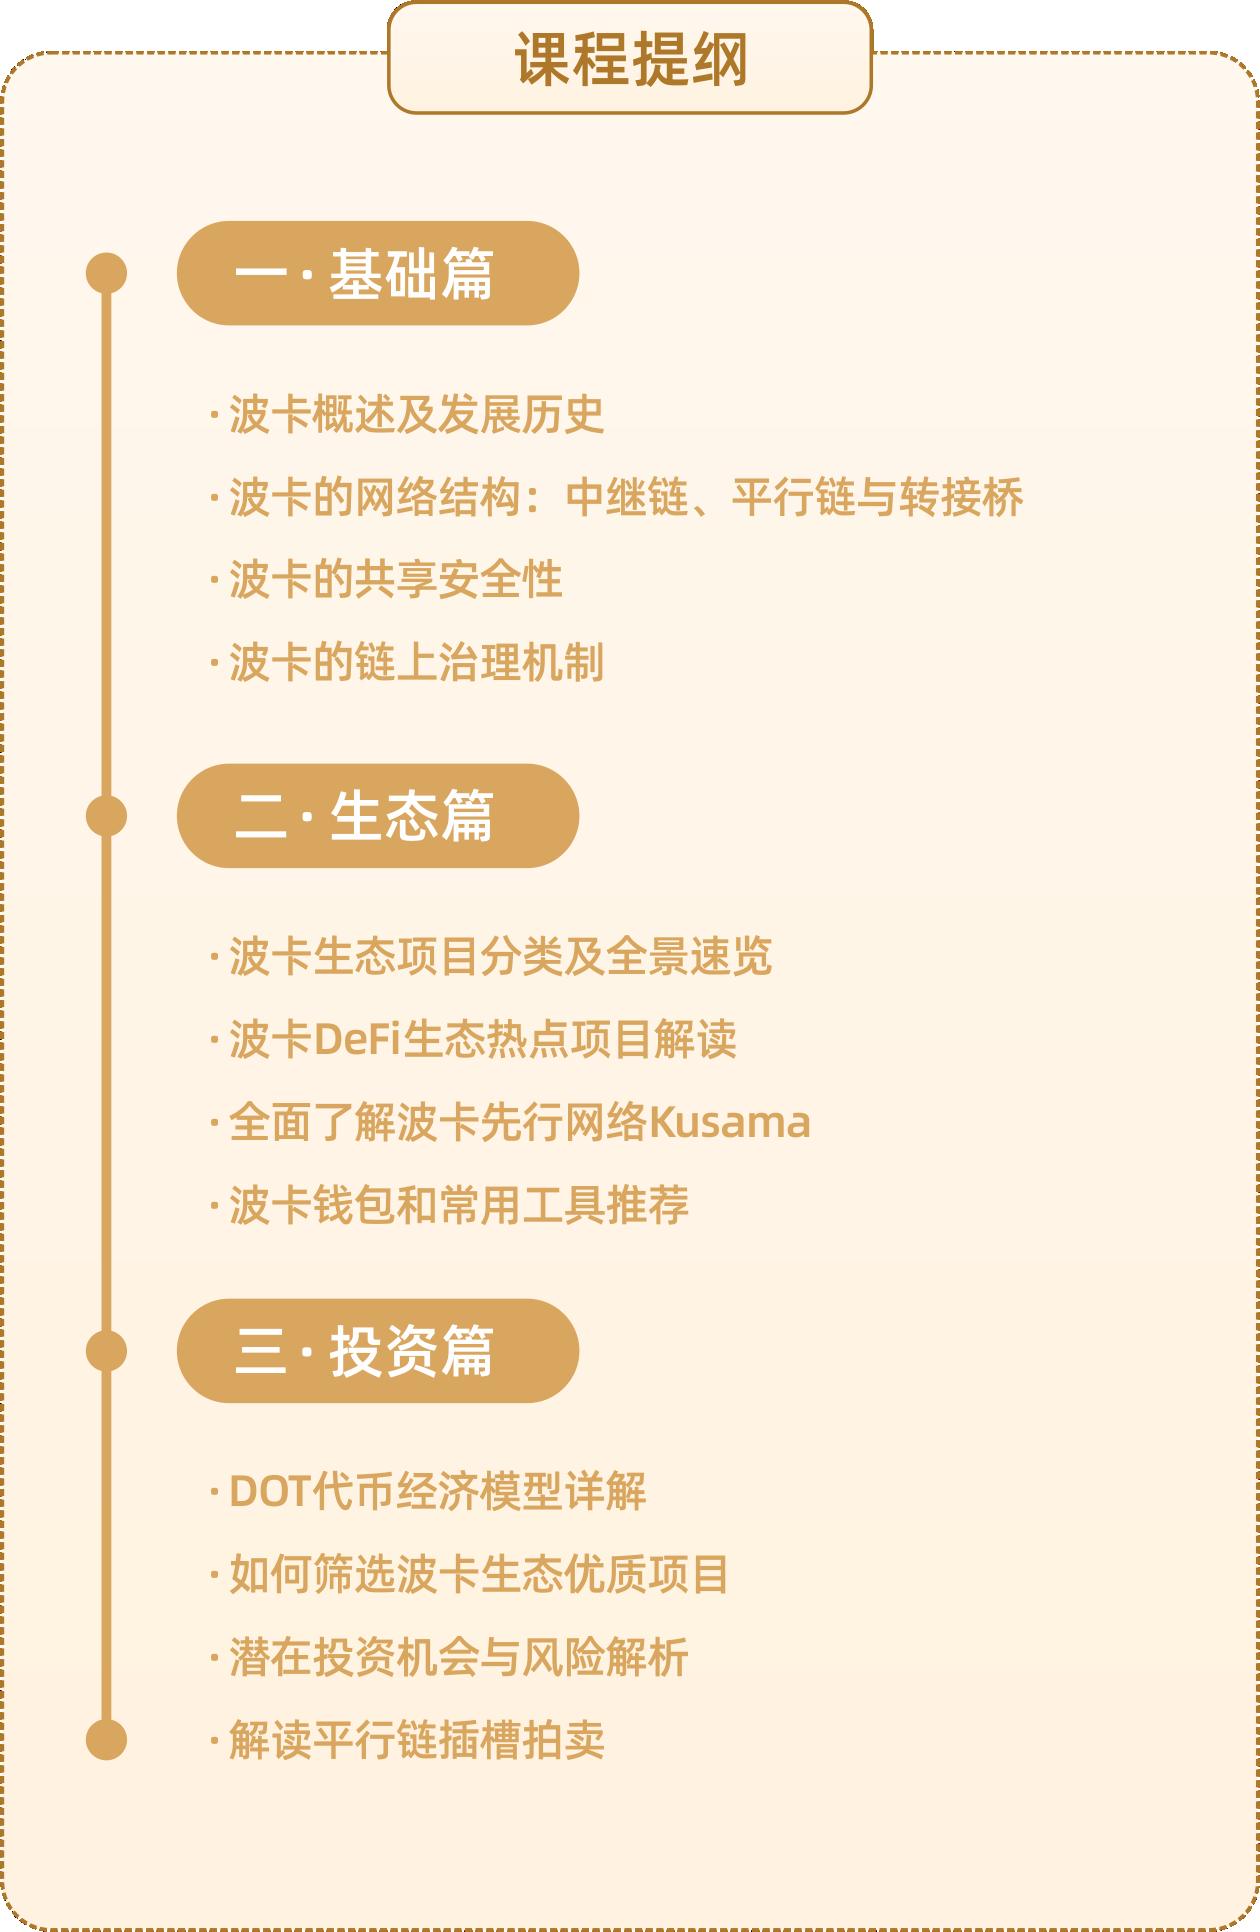 DeFi课程配图2.png